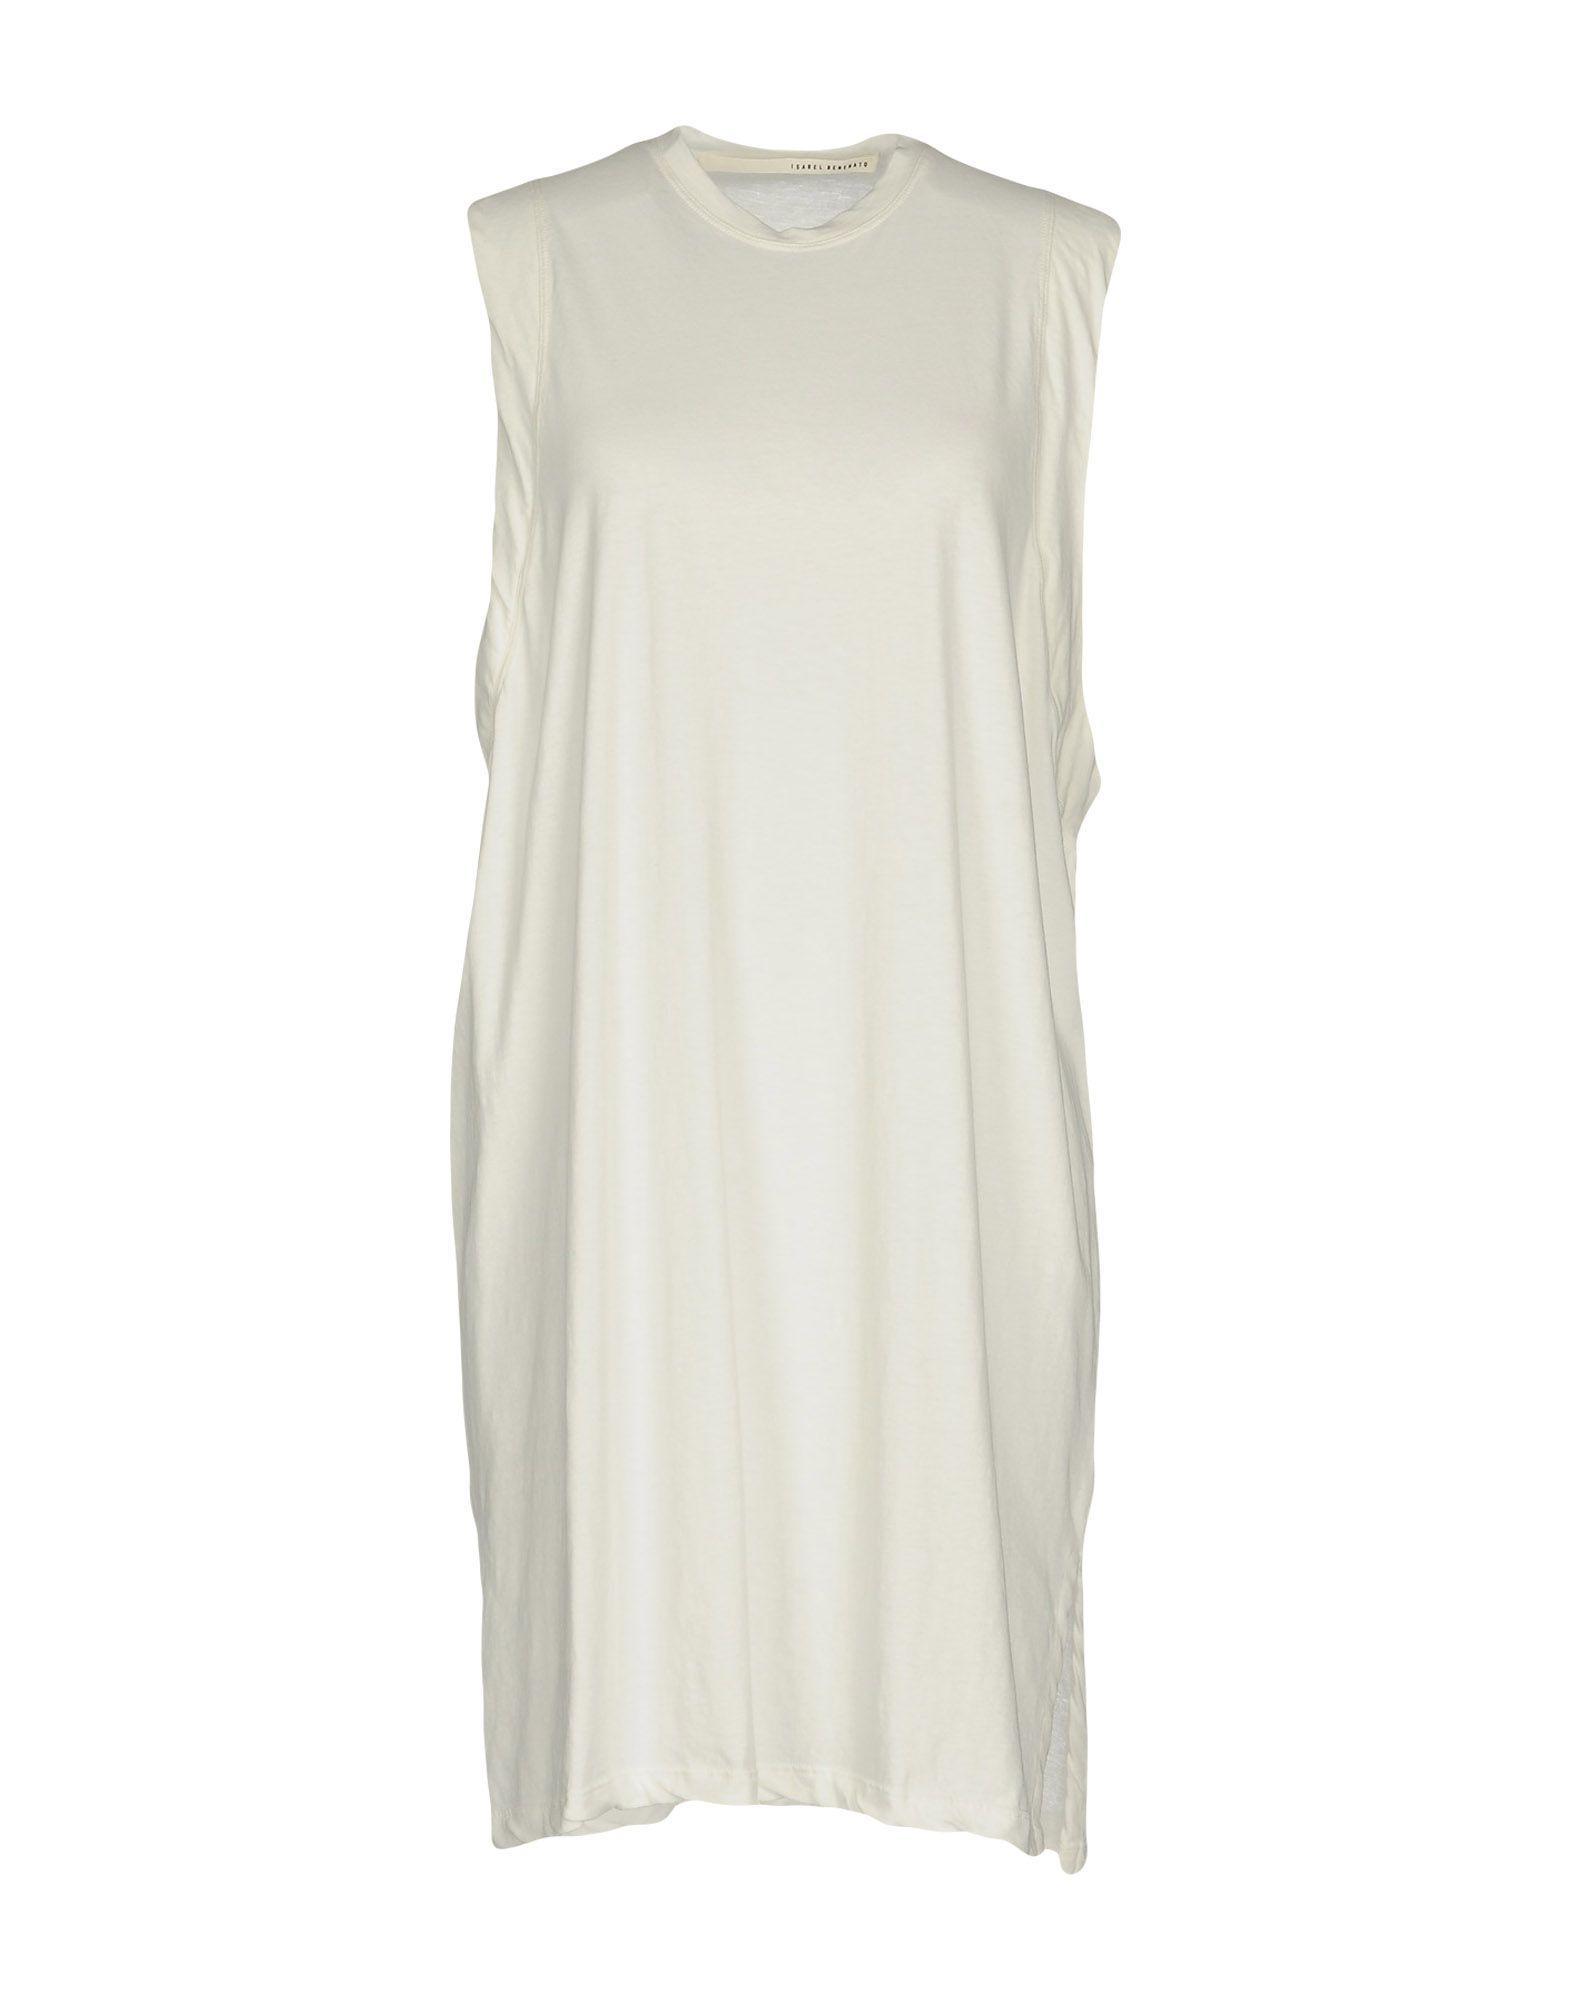 DRESSES - Short dresses Isabel Benenato TH048AUxeE